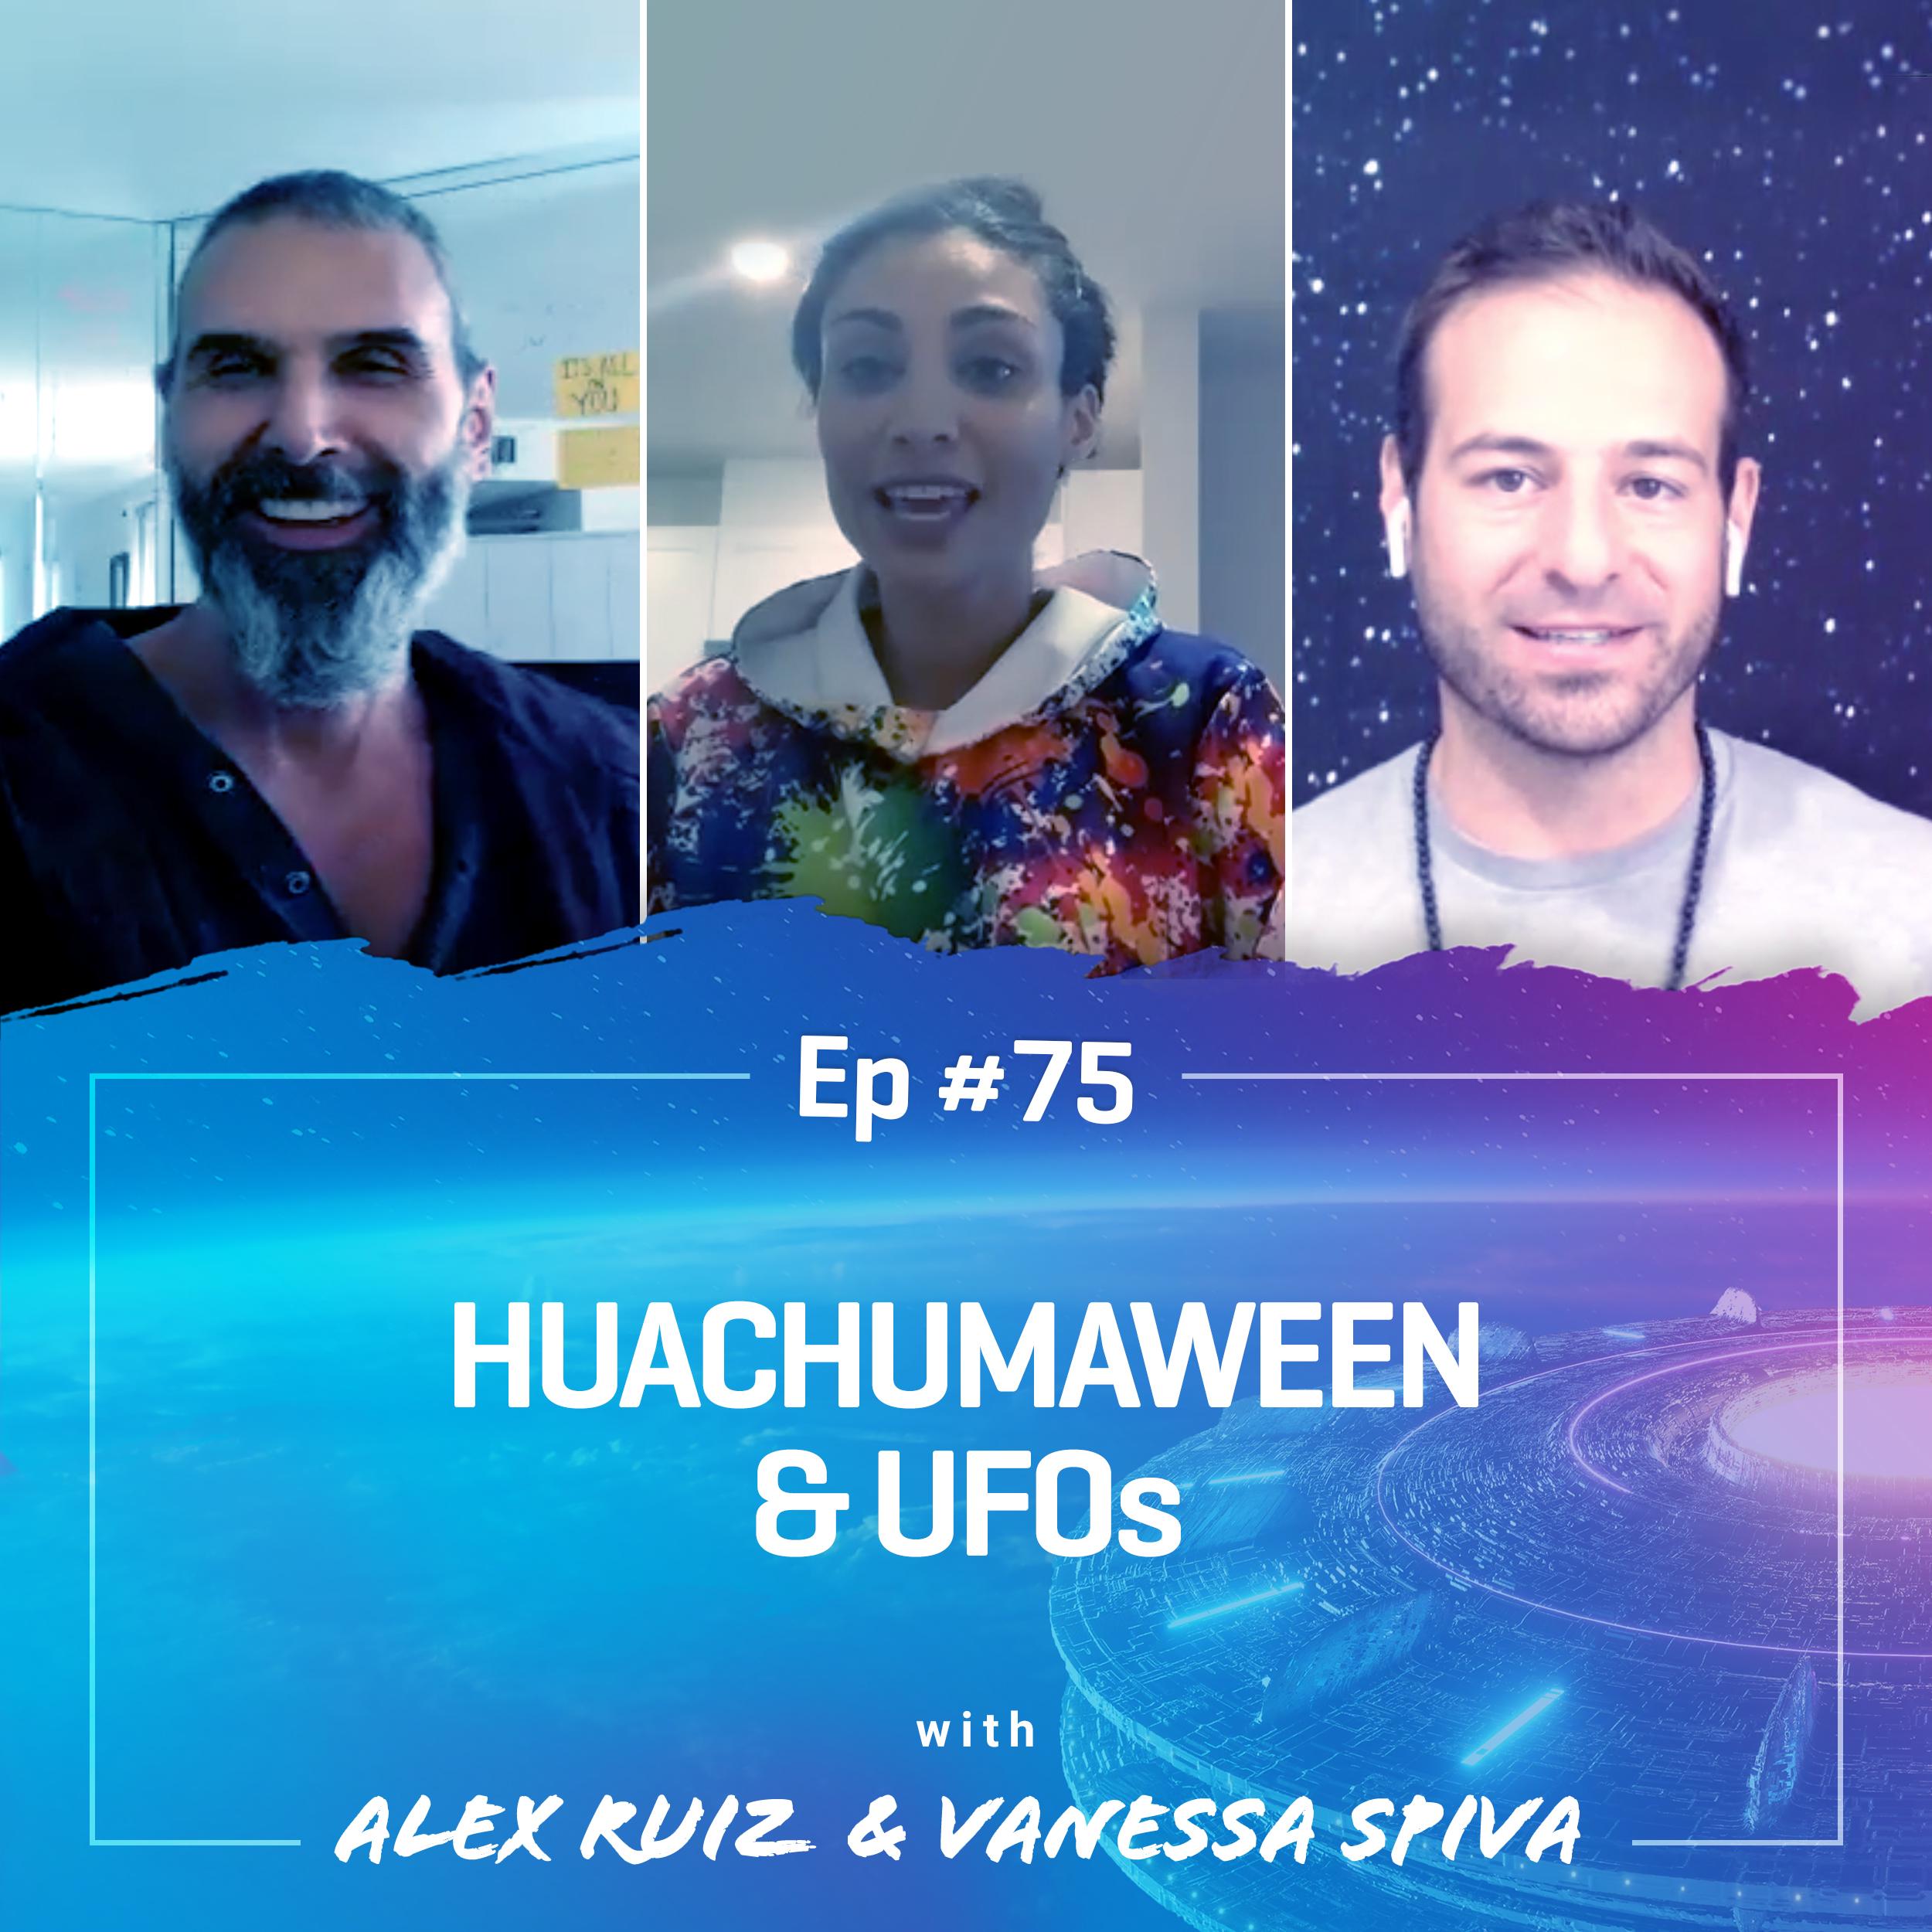 #75: Huachumaween & UFO's with Alex Ruiz & Vanessa Spiva